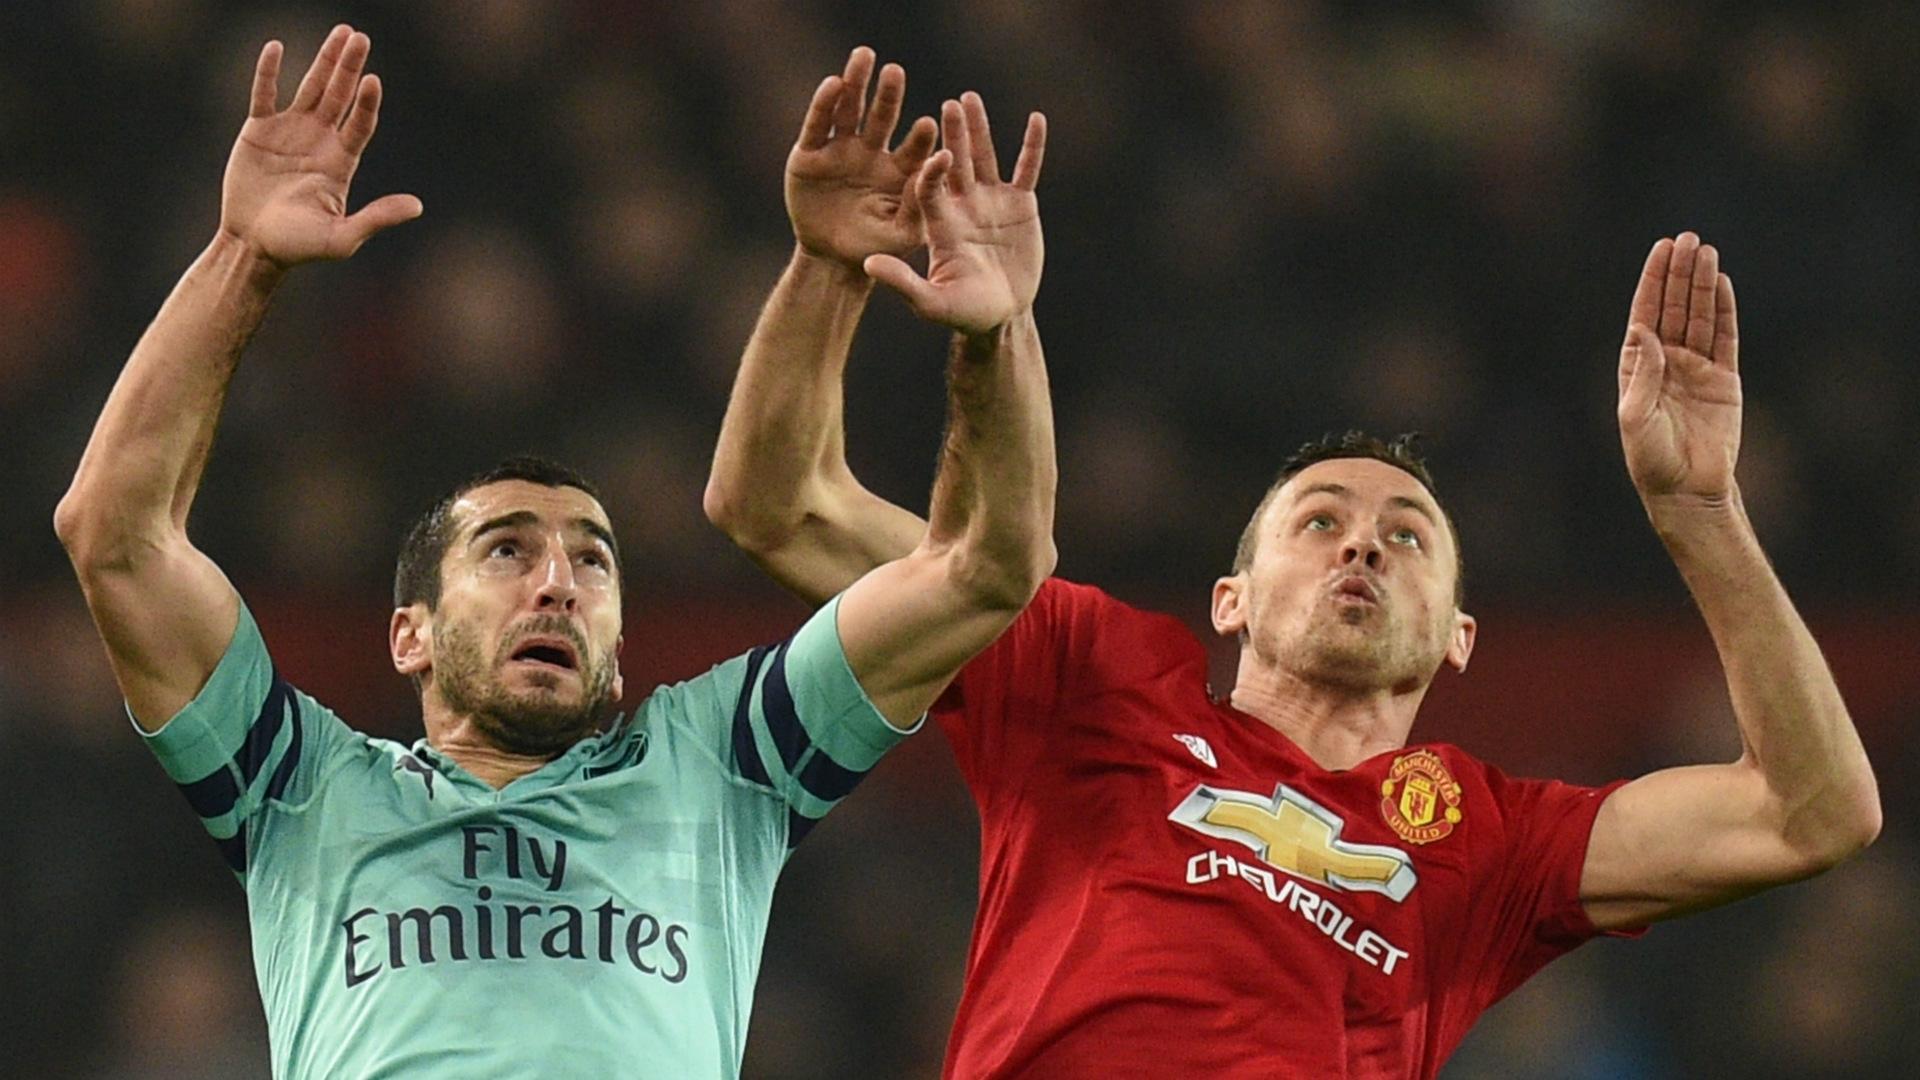 Henrikh Mkhitaryan Nemanja Matic Arsenal Man Utd 2018